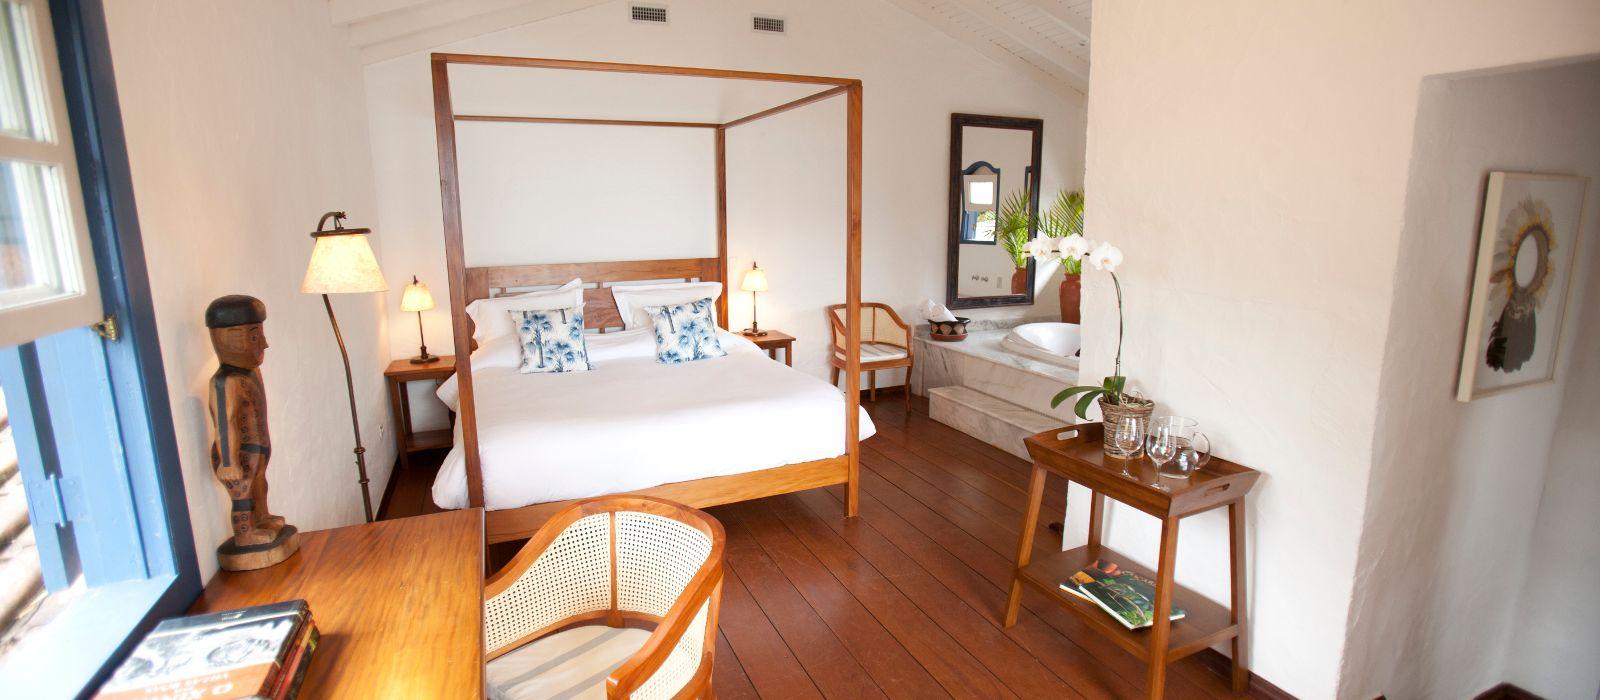 Hotel Pousada Picinguaba Brasilien